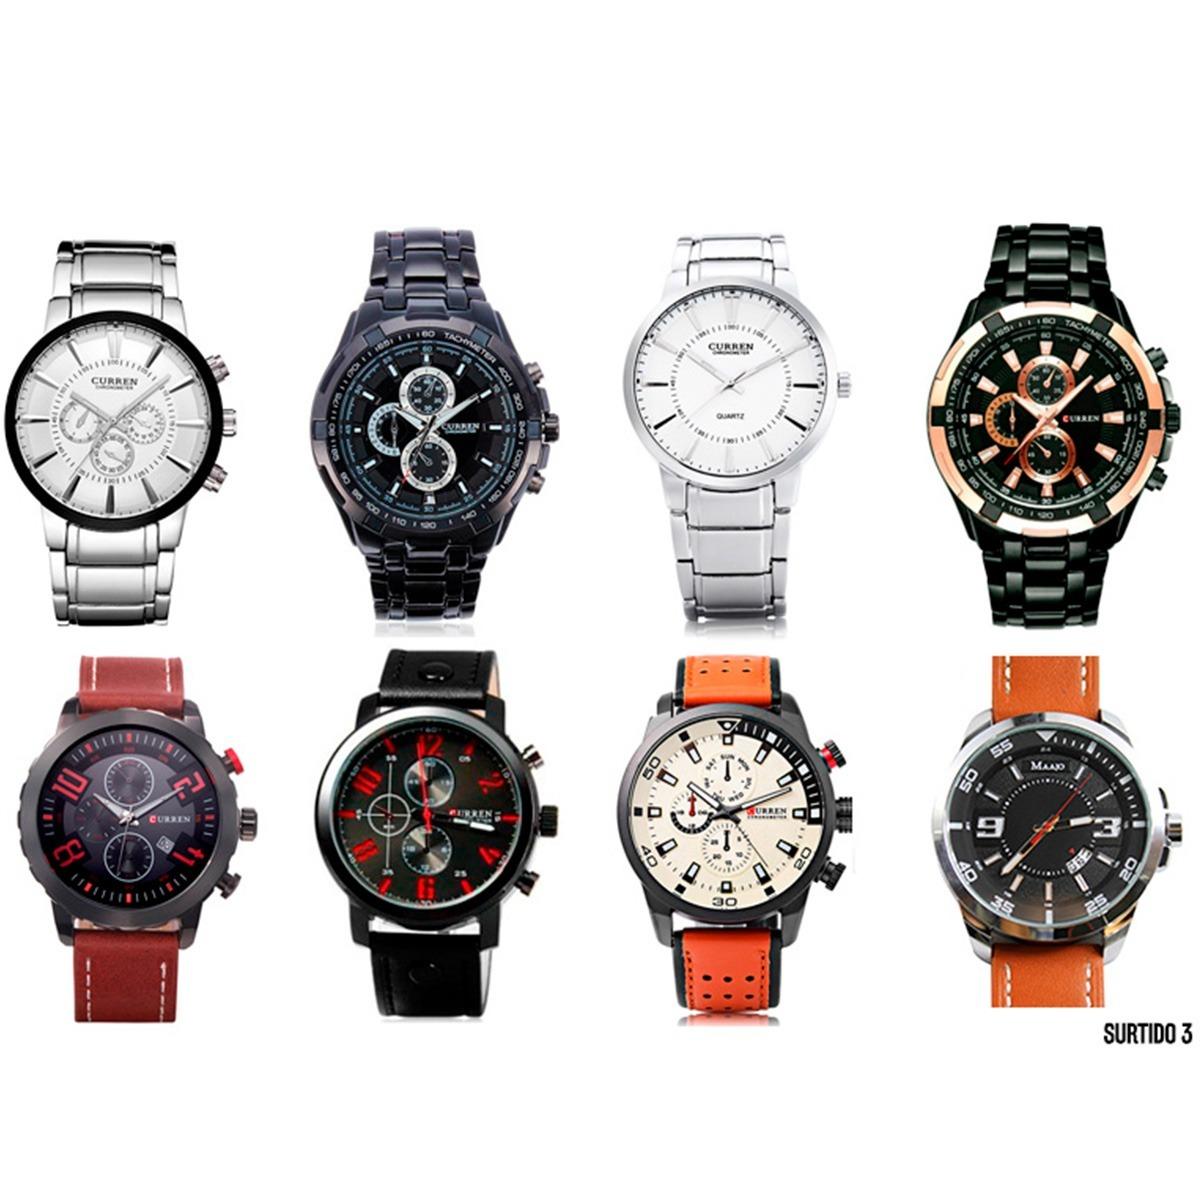 af8e4e054fe6 lote relojes hombre surtido curren 8 piezas precio mayoreo. Cargando zoom.